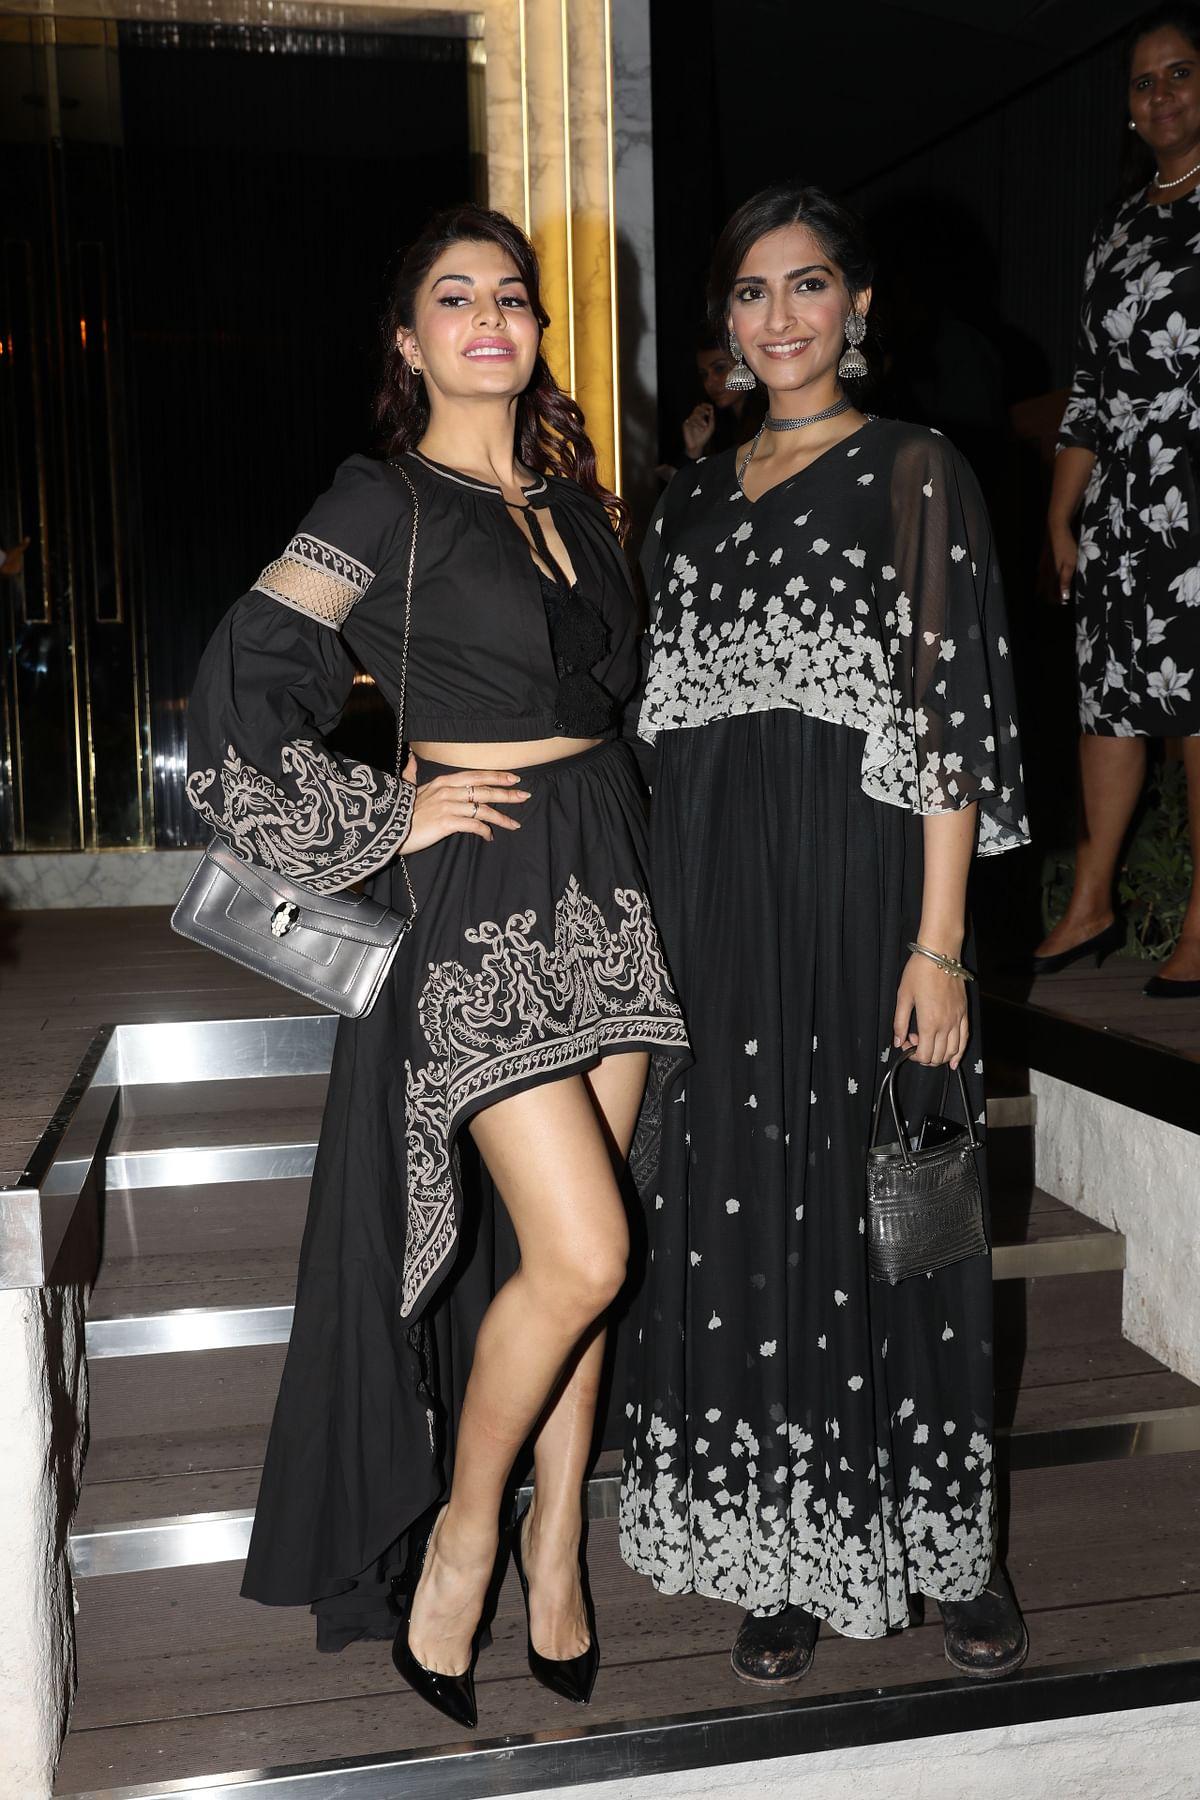 Looks like good pals Jacqueline Fernandez and Sonam Kapoor matched their dresses. (Photo: Yogen Shah)